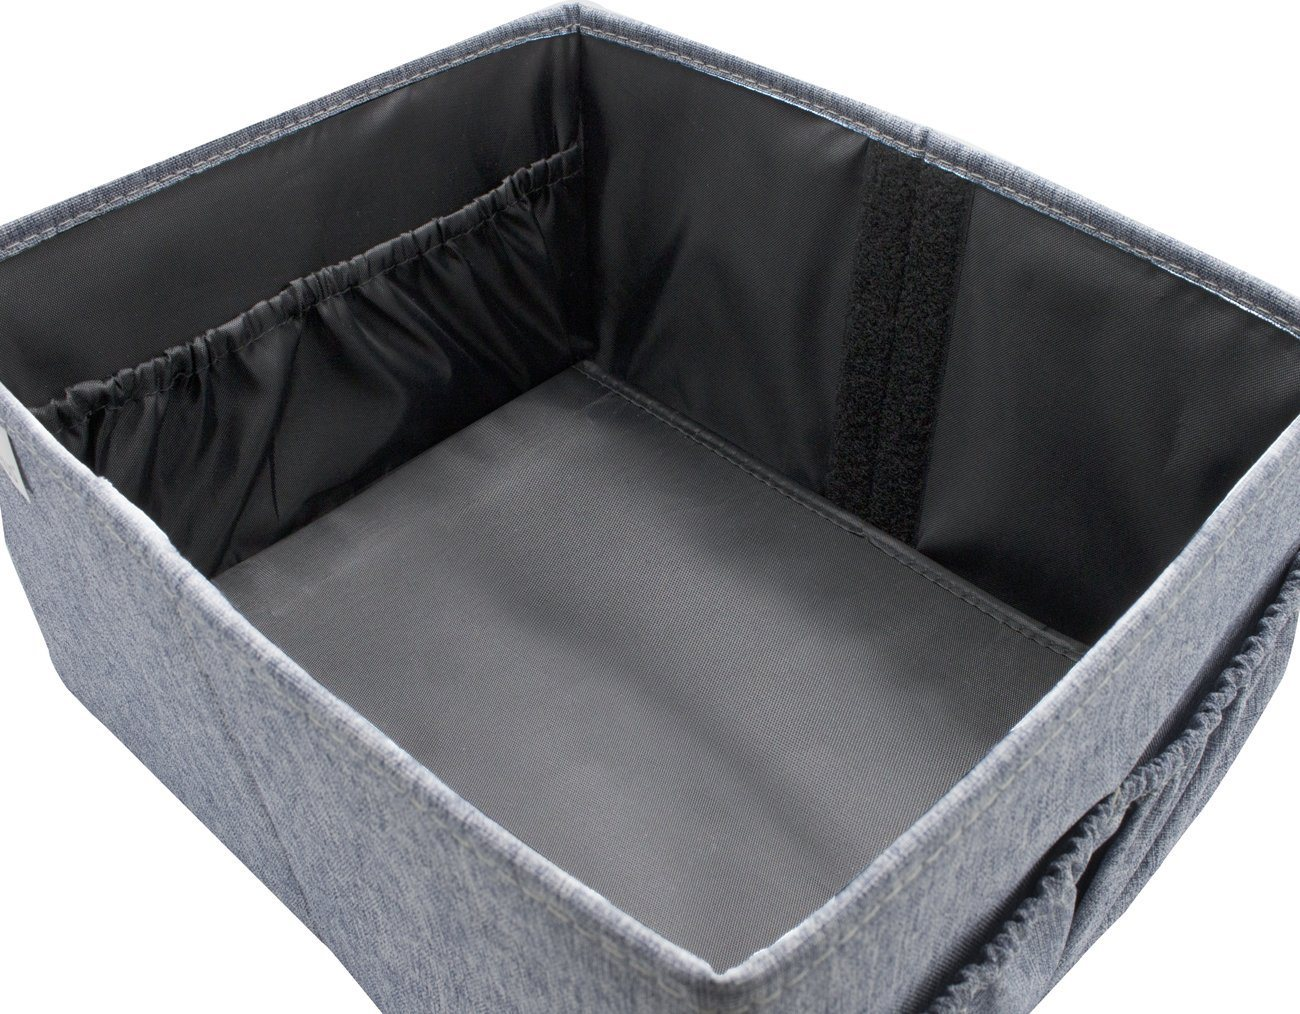 China Classic Look Felt Storage Bag Baby Diaper Caddy Organizer ...